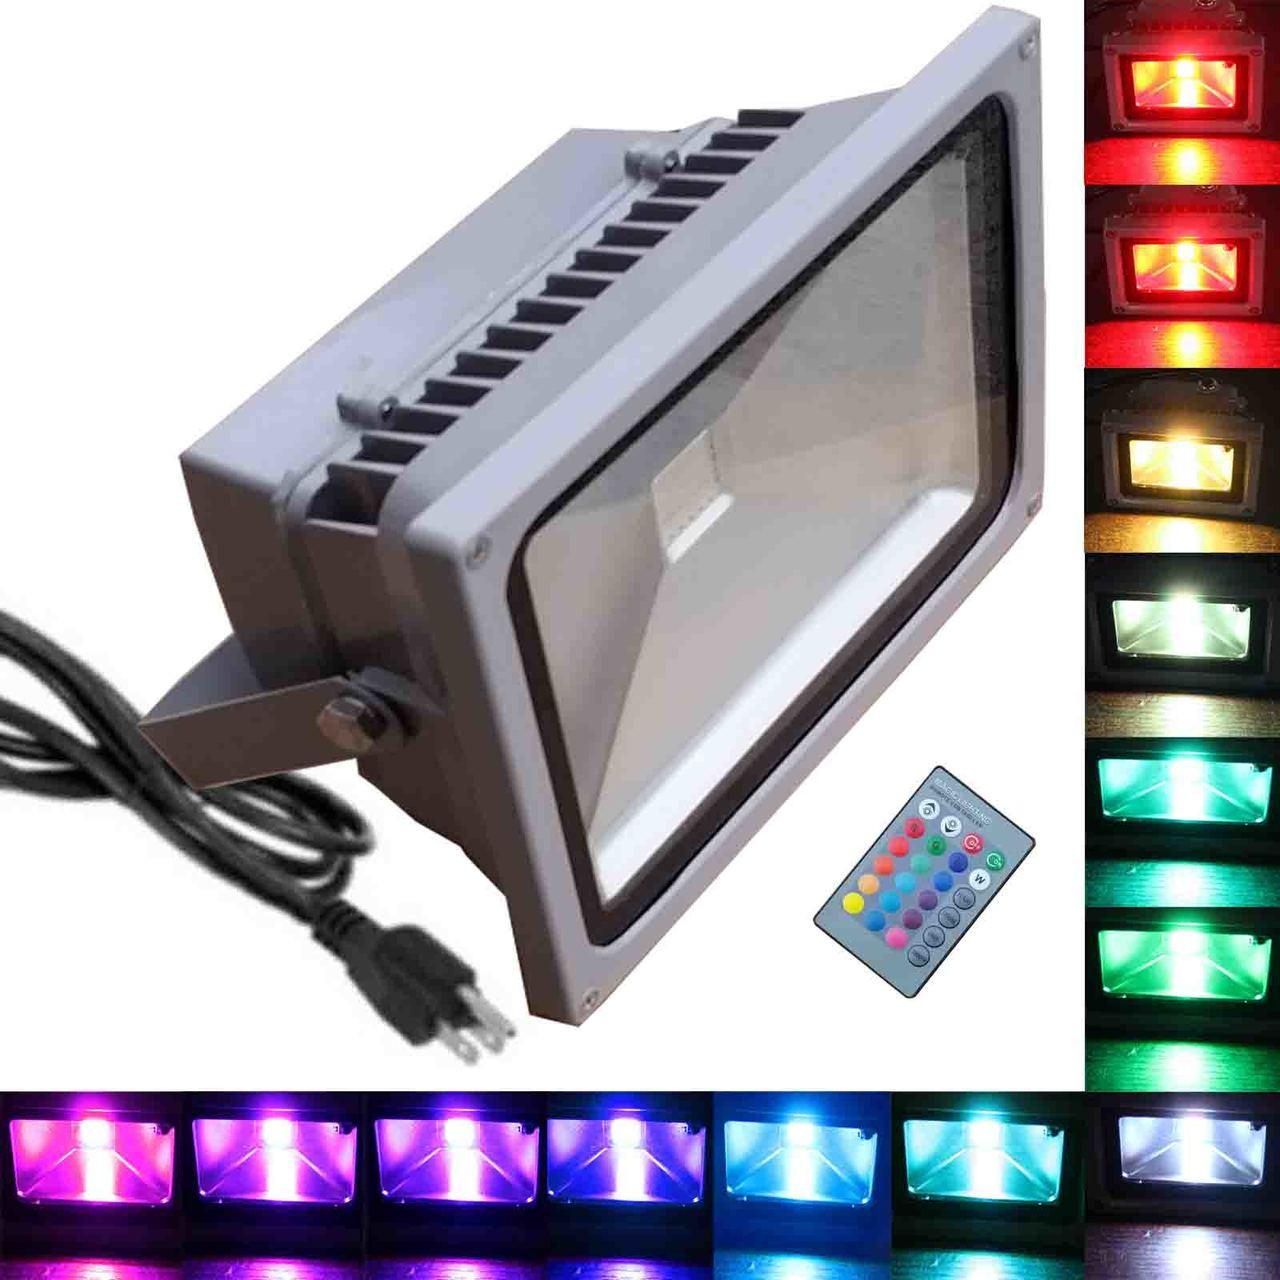 50W RGB Flood Light - TDLTEK 50W RGB Color Changing LED Flood Light  /Spotlight/Landscape Lamp/Outdoor Security Light With[ Memory Function],  [US 3